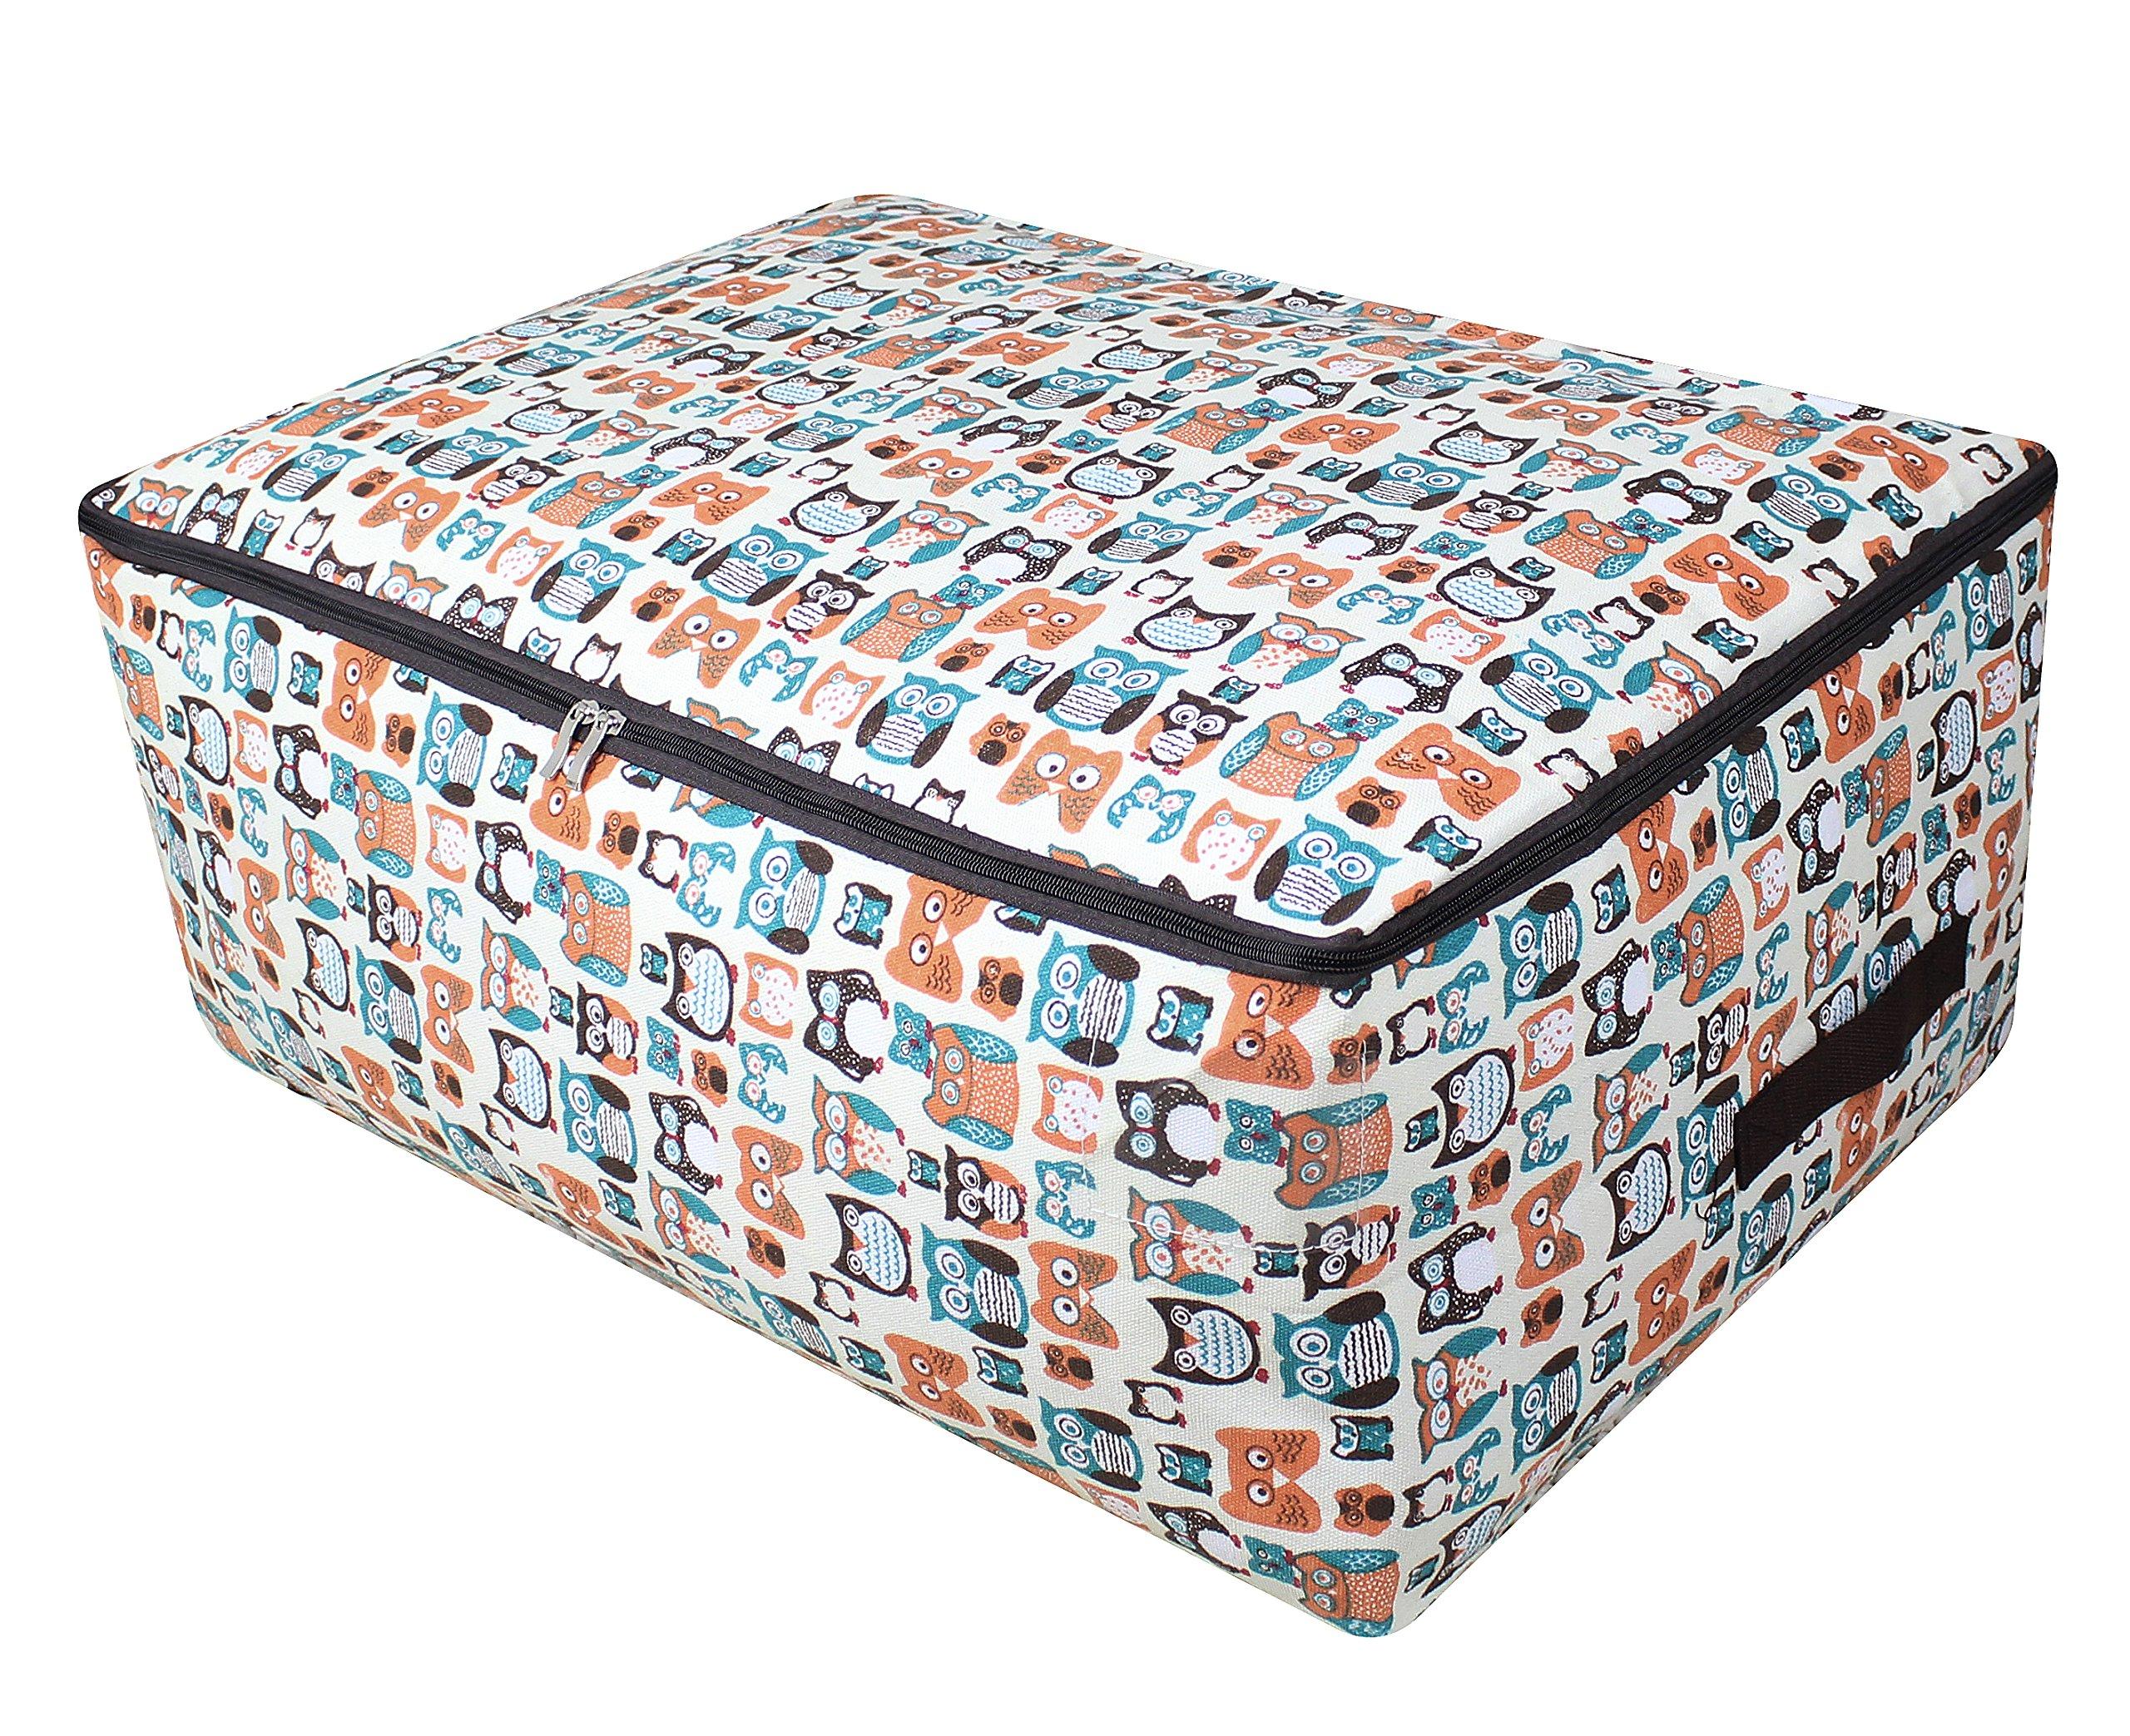 Bolsa de almacenamiento de edredón, organizador de almacenamiento de edredón Bolsa de ahorro de espacio